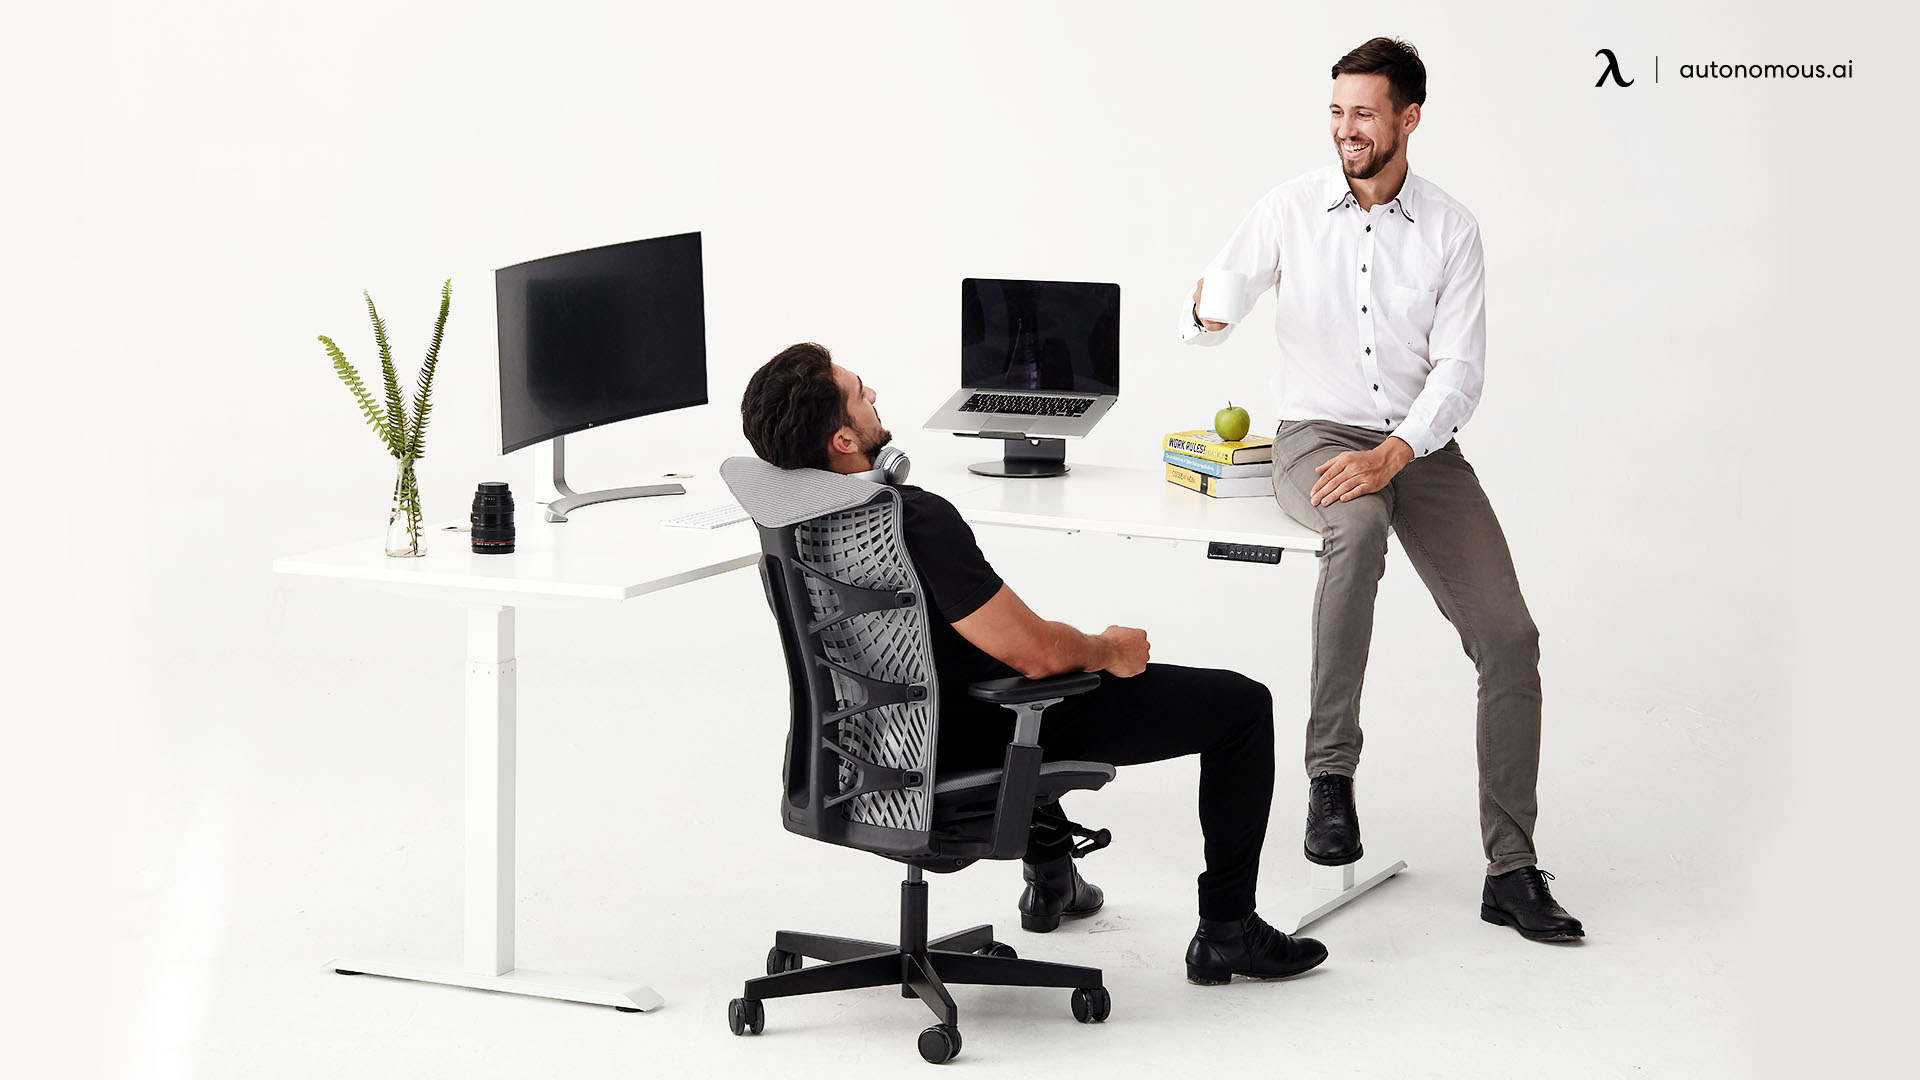 Getting an ergonomic chair